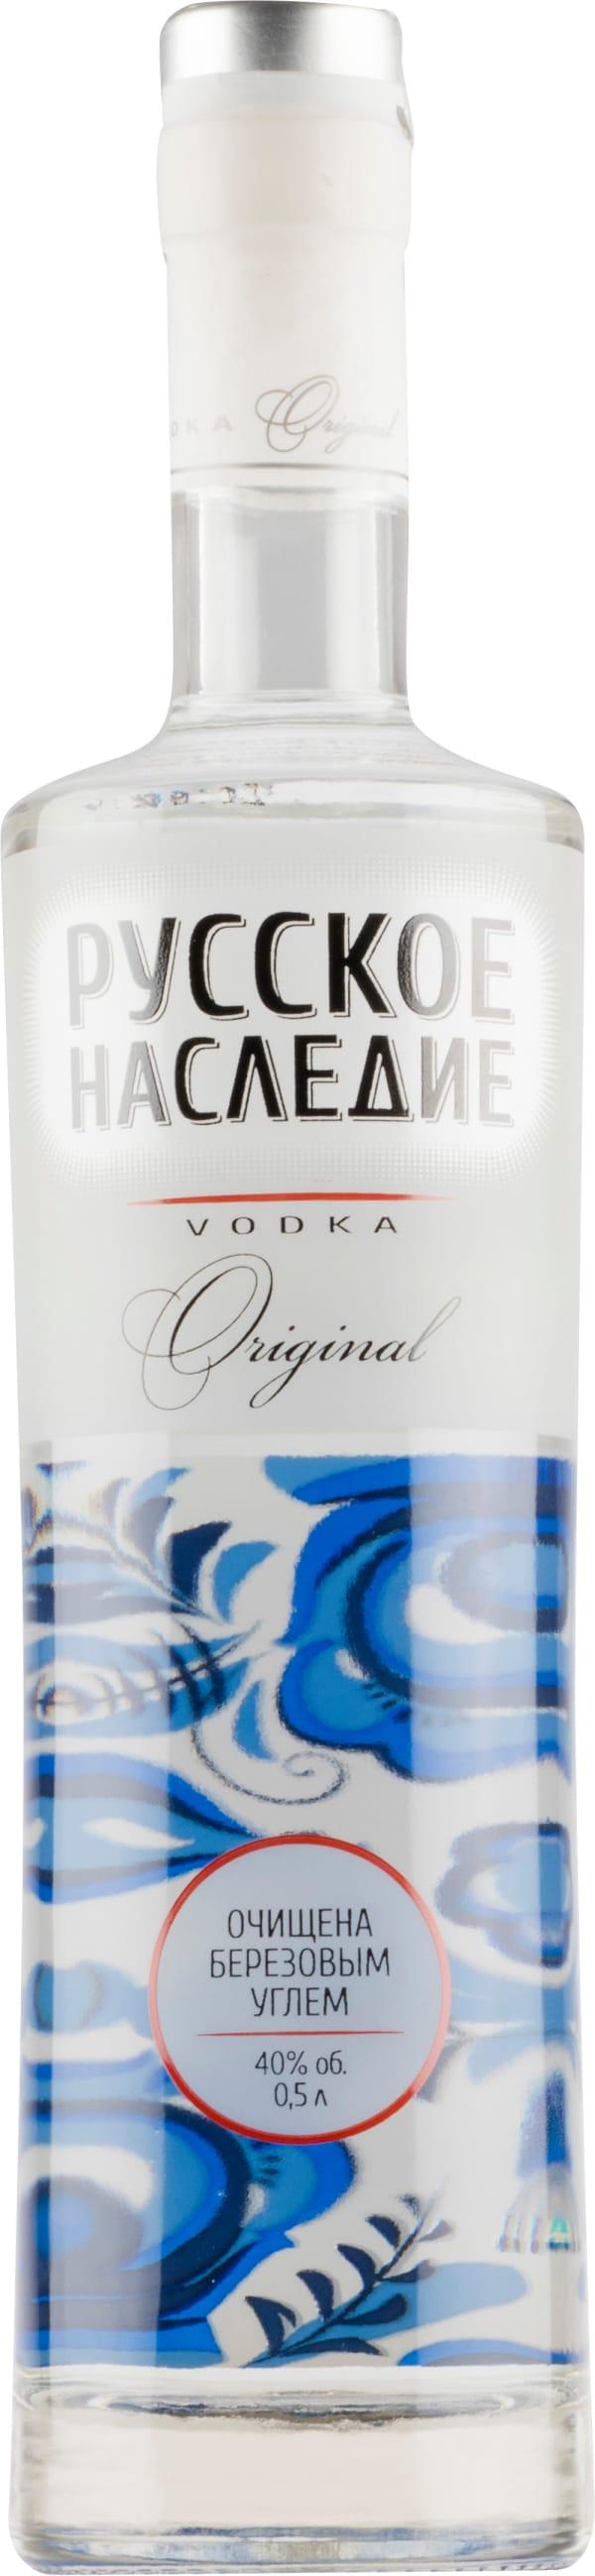 Russian Heritage Vodka